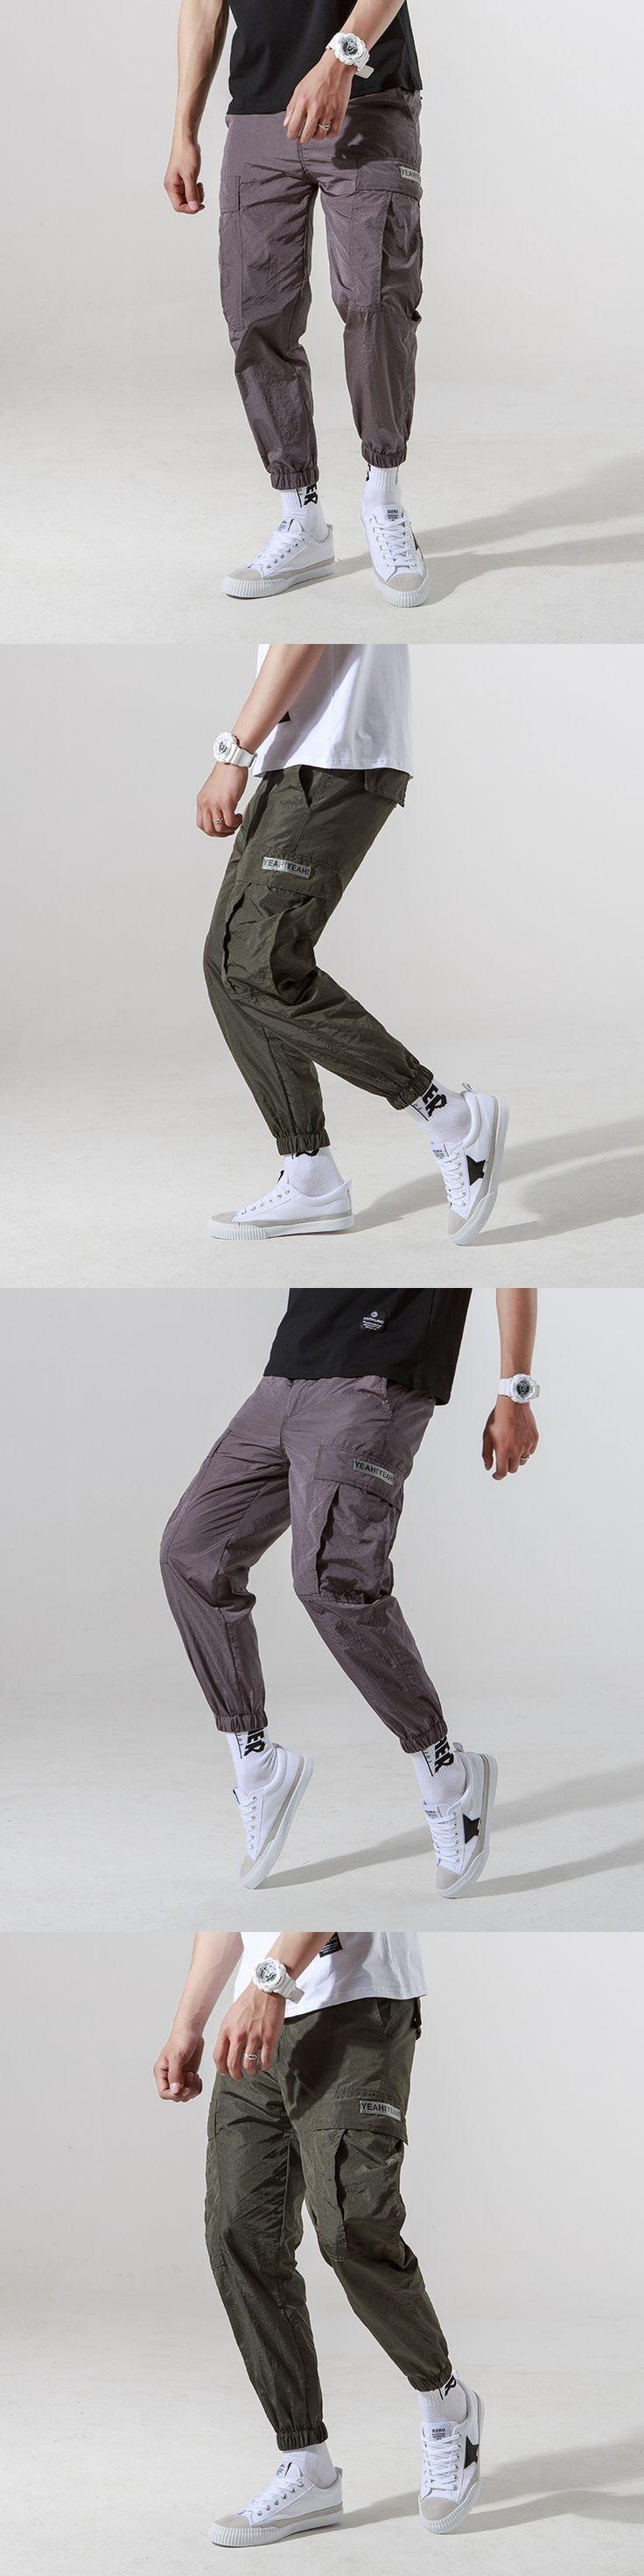 2017 summer mens joggers casual cargo pants fashion men Jogger Pants men hip hop army urban clothes pants green ,black trousers